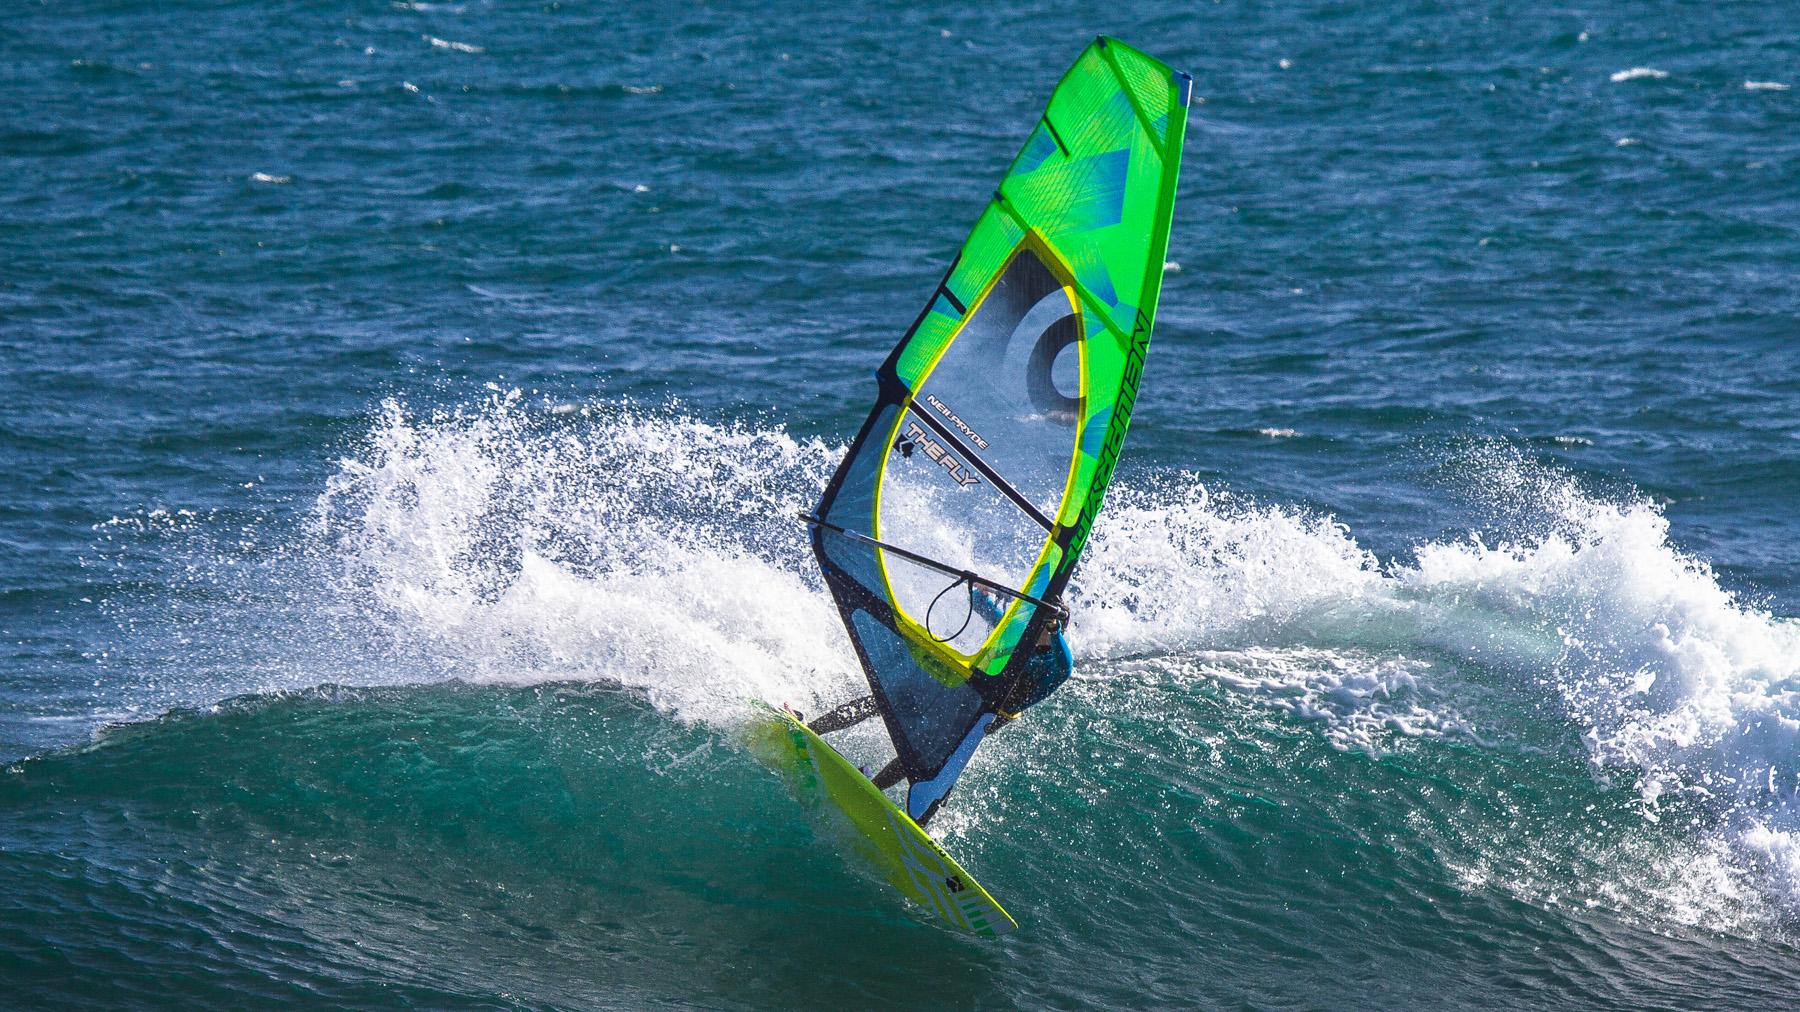 flynns reef windsurfing phillip island